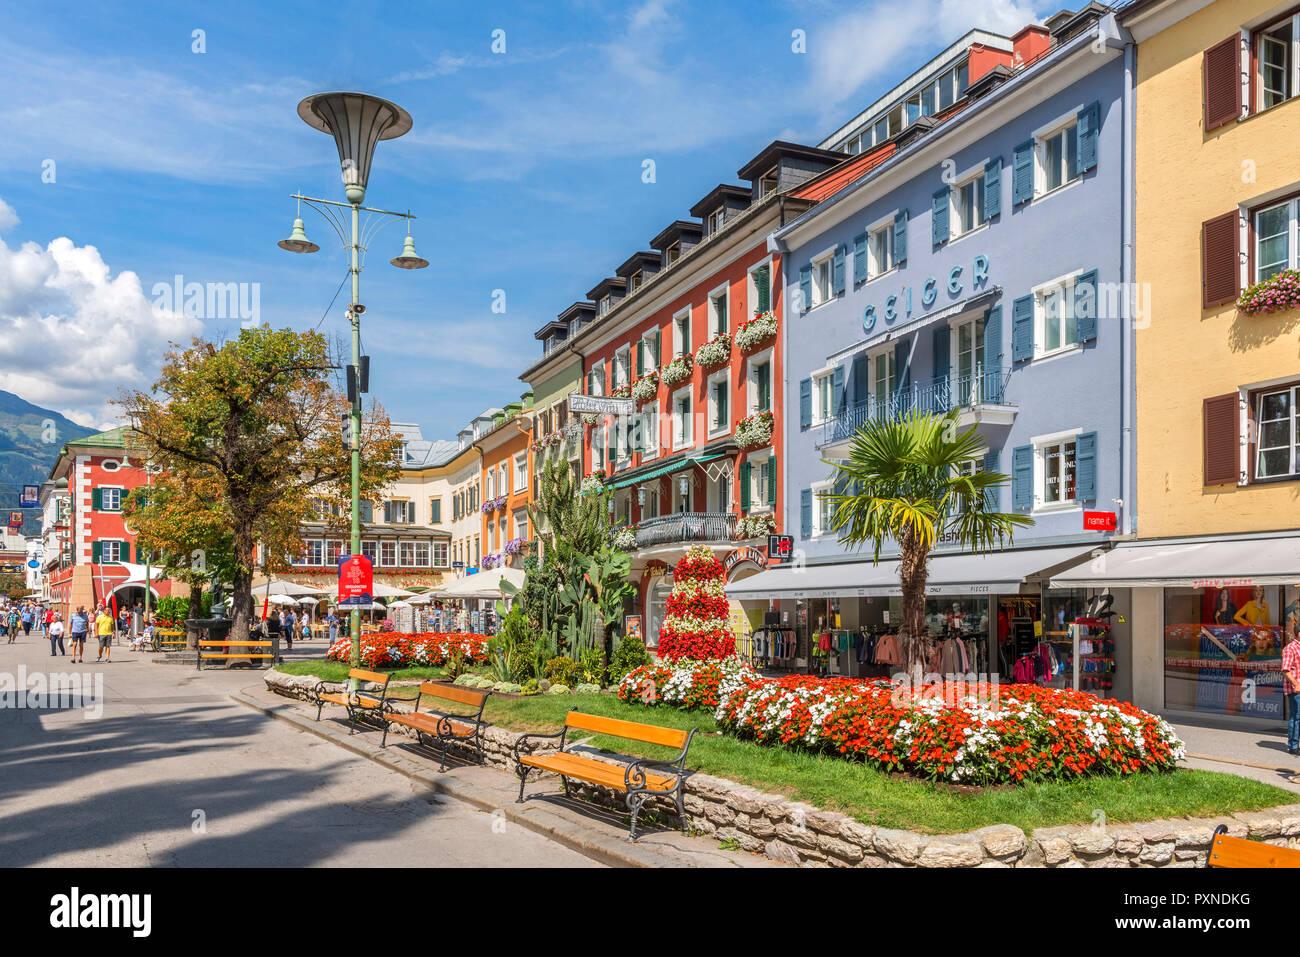 Main Place, Lienz, Tyrol, Austria - Stock Image